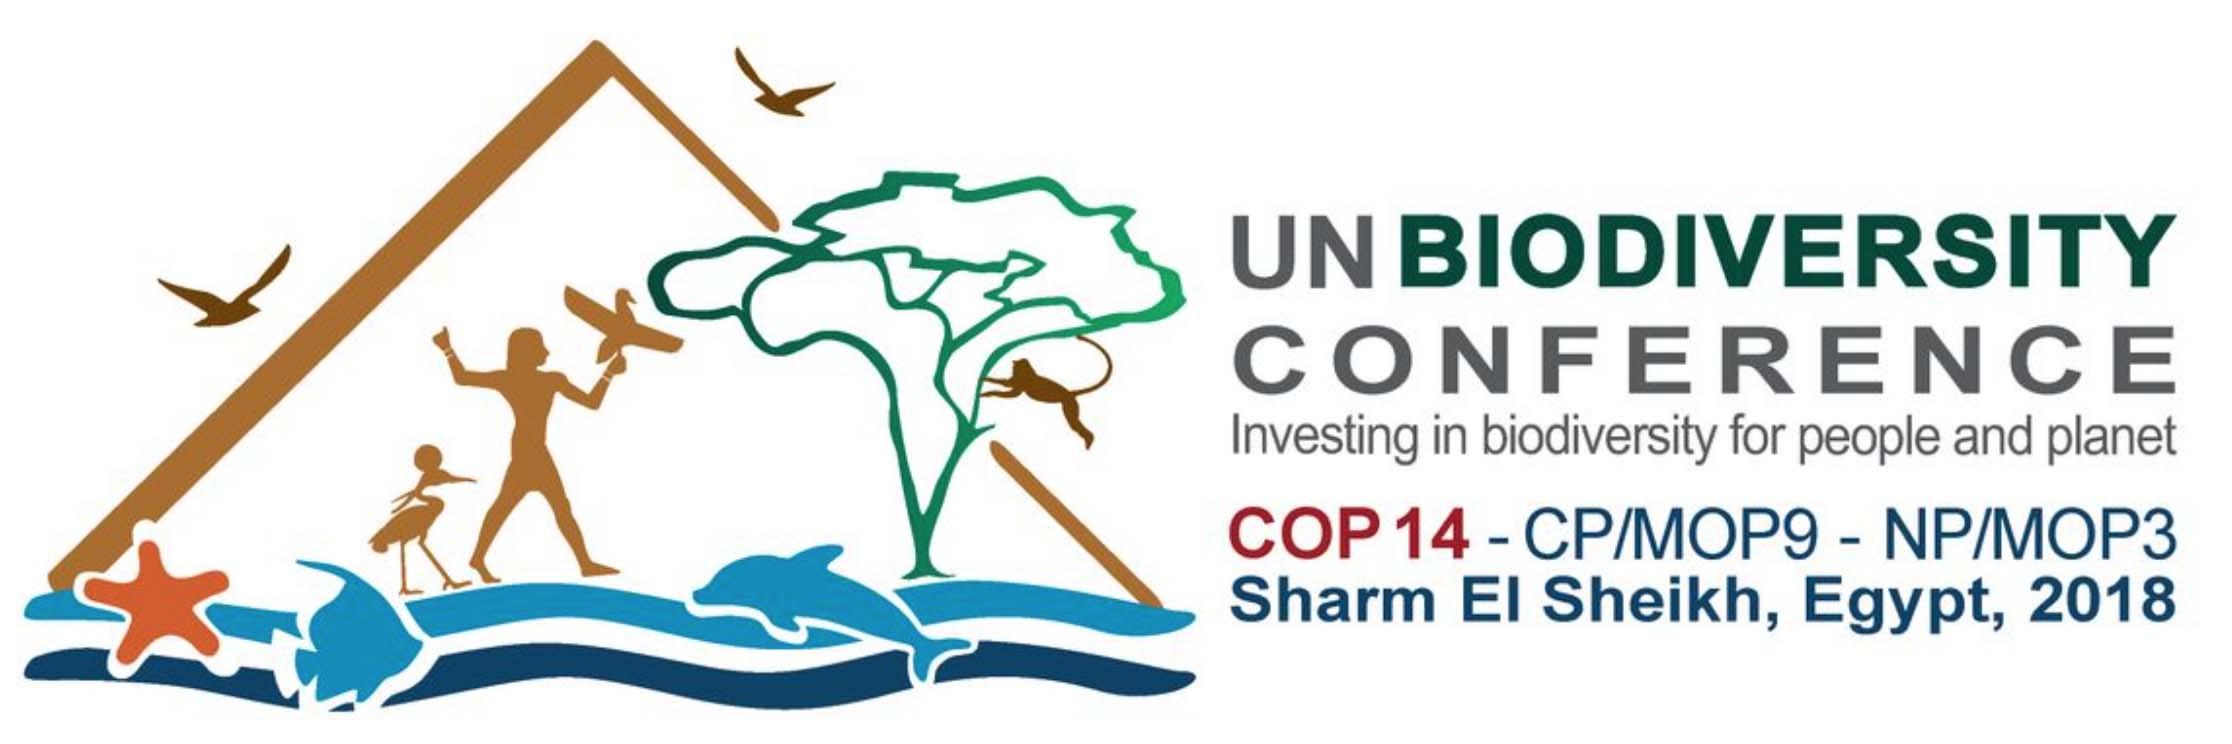 COP14 CBD @ Sharm El-Sheikh, Egypt | Sharm El-Sheikh | South Sinai Governorate | Egypt